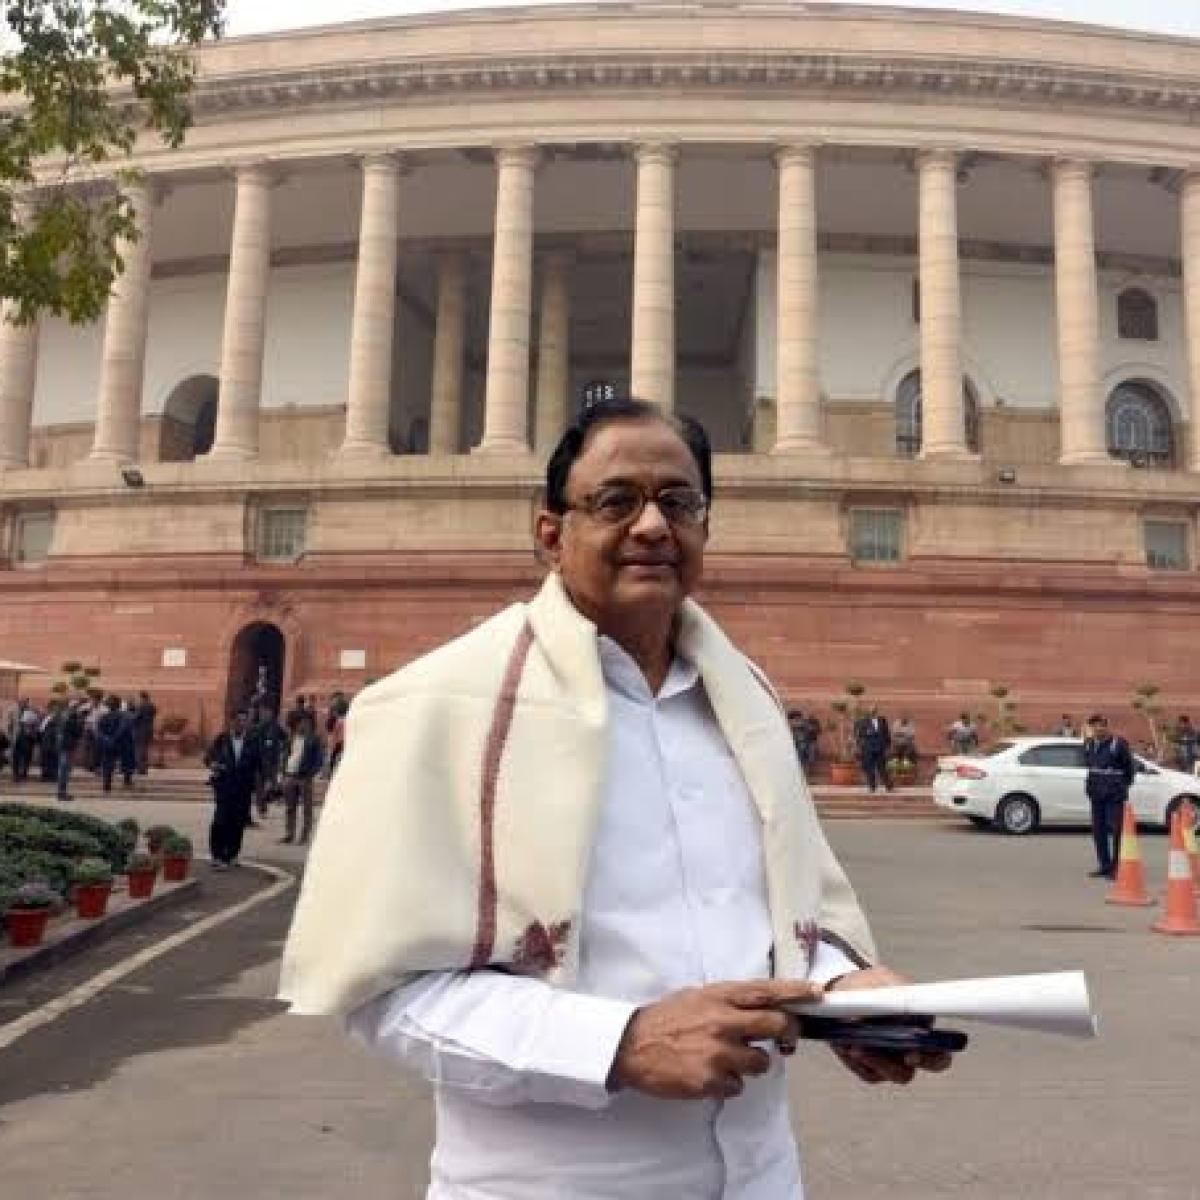 India's economy broken, leadership failed: Chidu